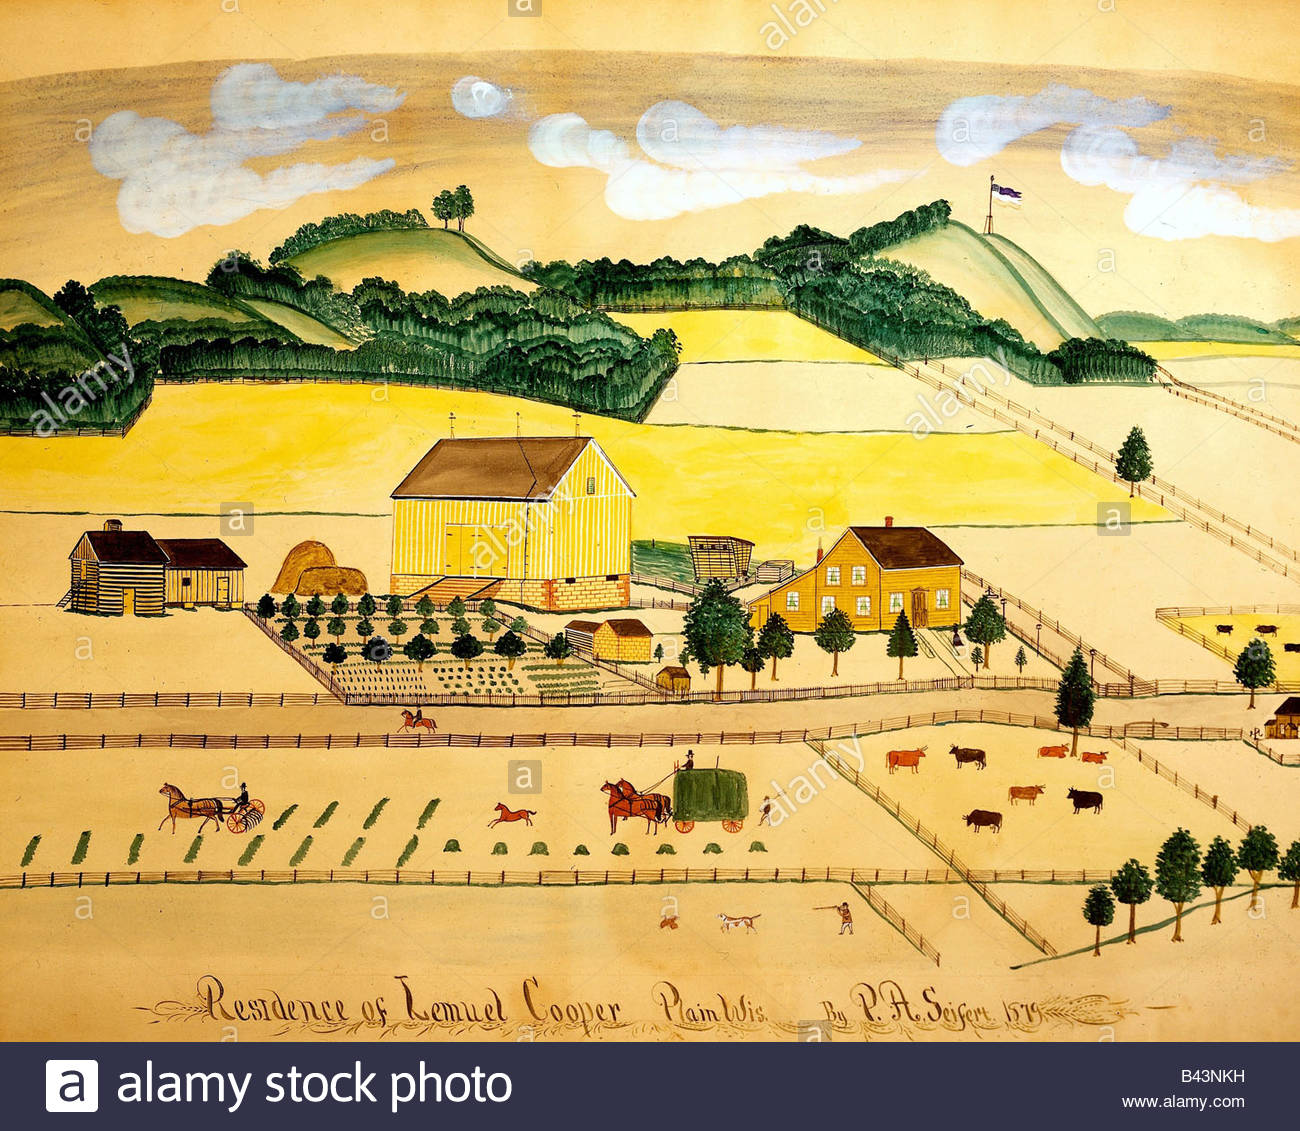 Belle arti - Seifert, Paolo A. (1840 - 1921), pittura, 'Residence di Samuel Cooper, Pianura, Wisconsin' Immagini Stock